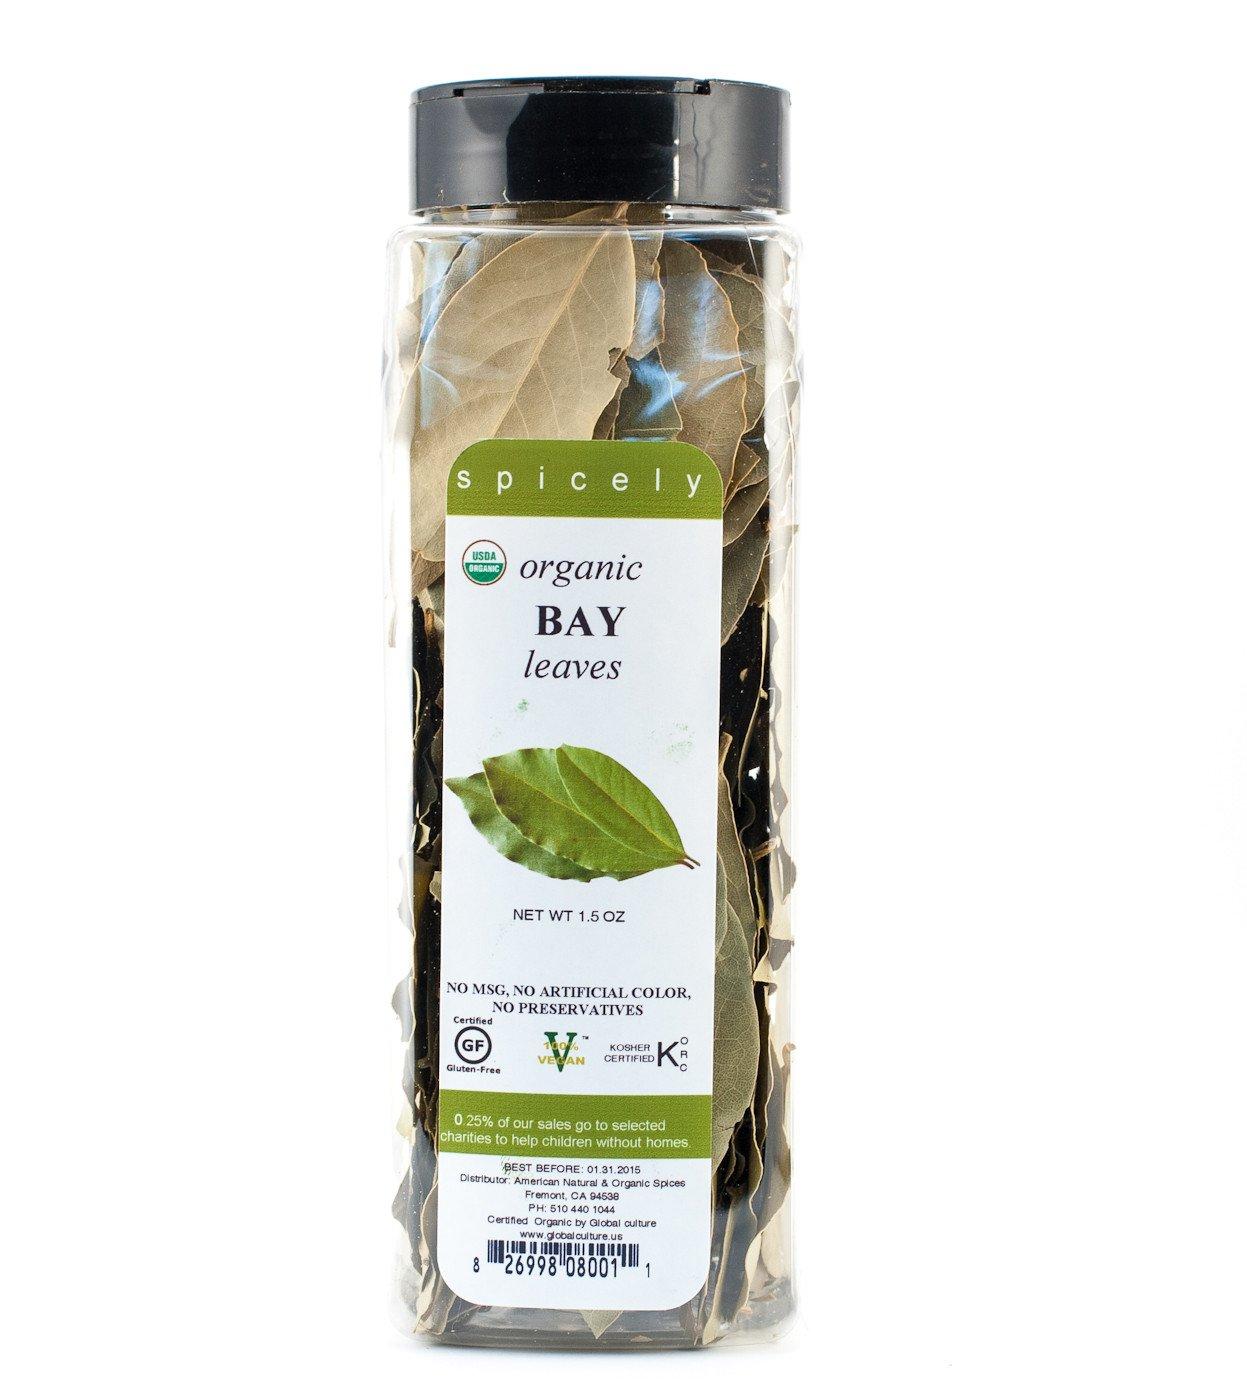 Spicely Organics, Bay Leaves, Turkish, 1.5 oz